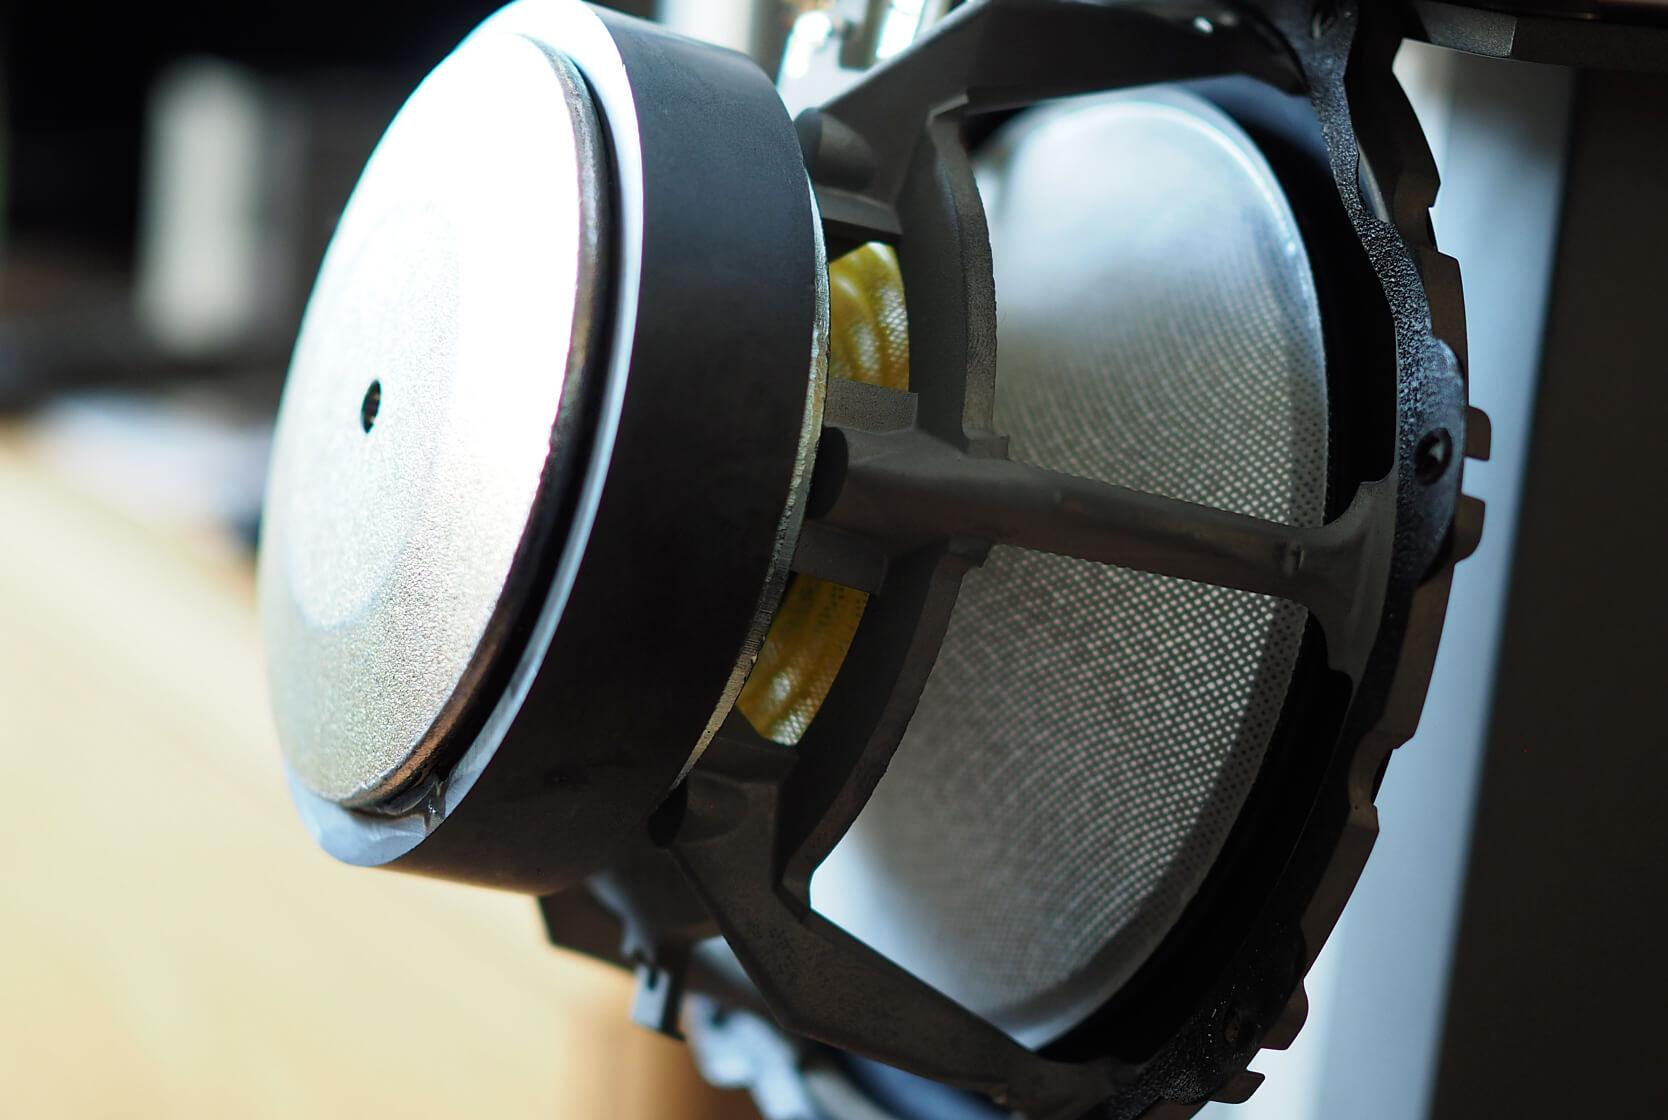 Bowers & Wilkins 606 Bassmitteltreiber ausgebaut